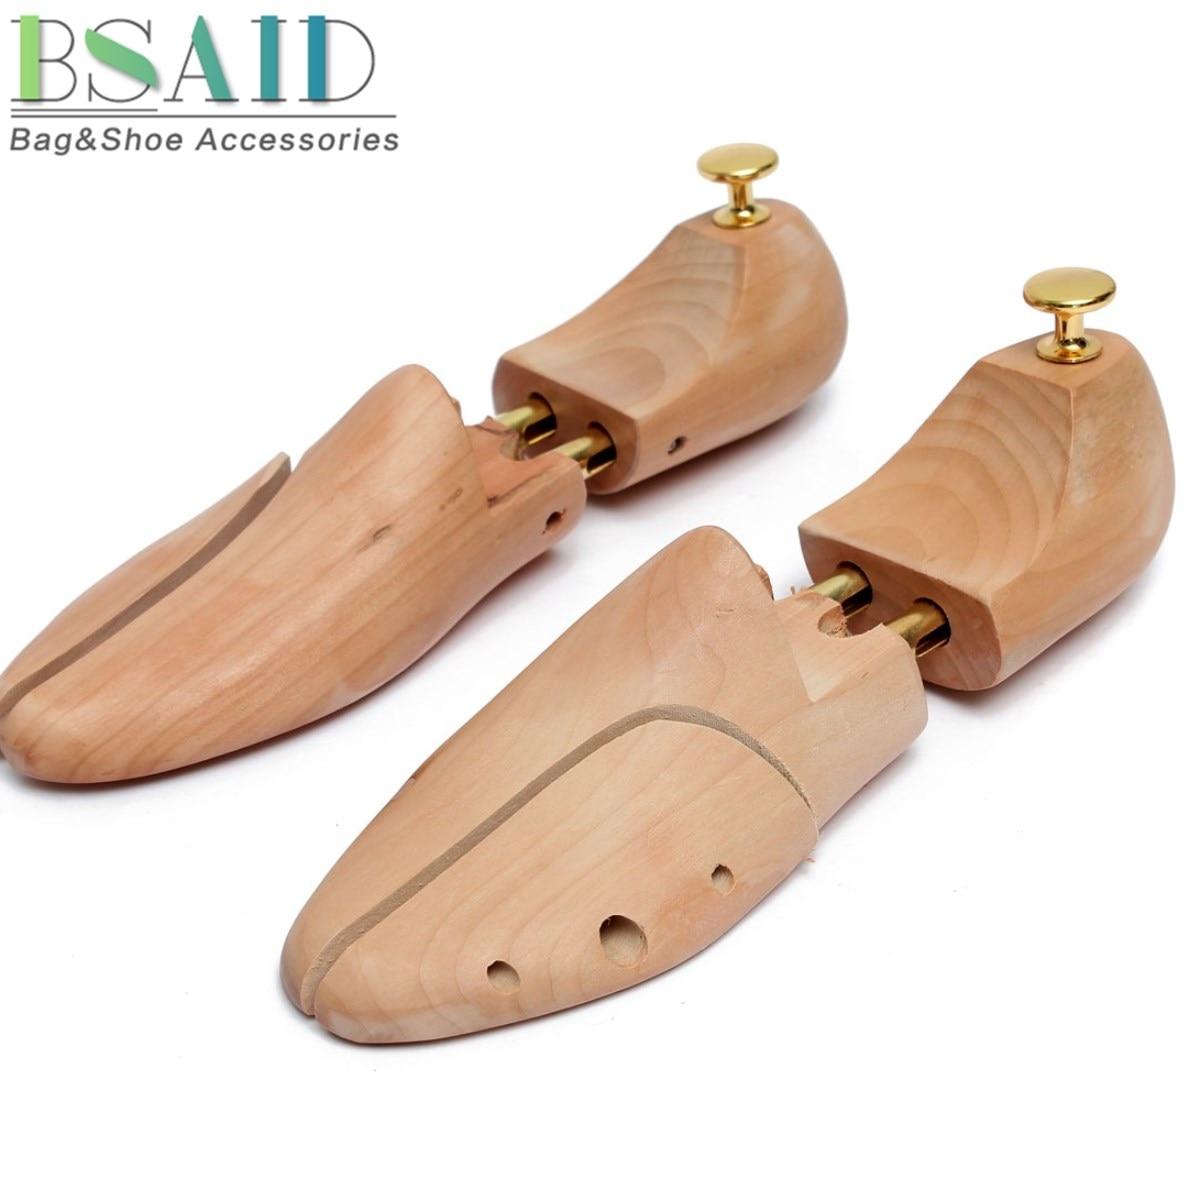 Shoe Tree Brand